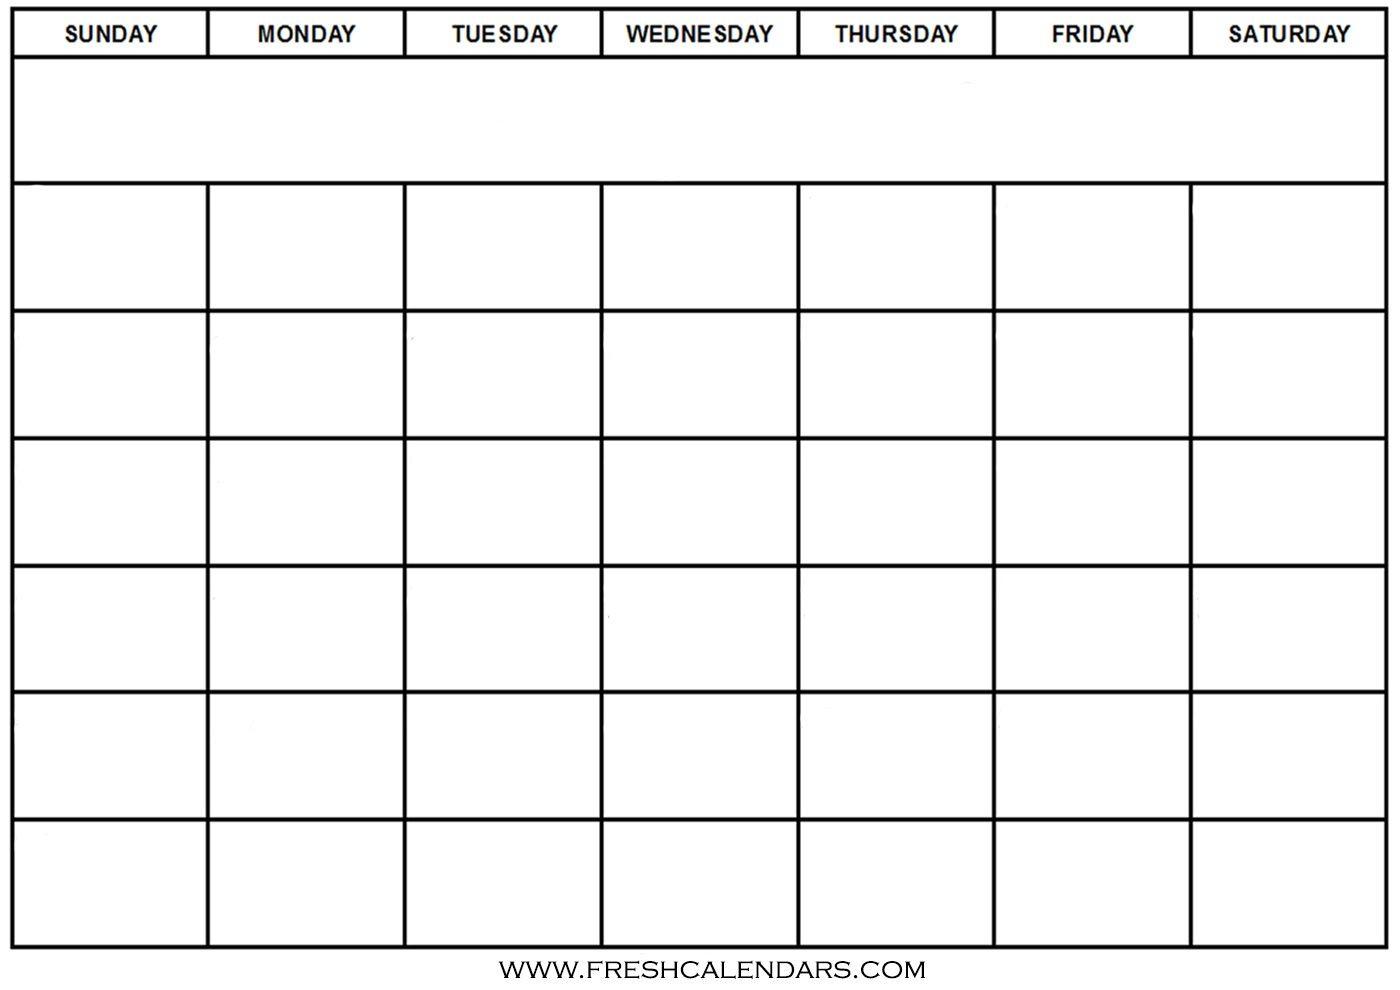 Calendar Template Free Printable Blank Calendar Wonderfully regarding Free Printable Blank Calendars